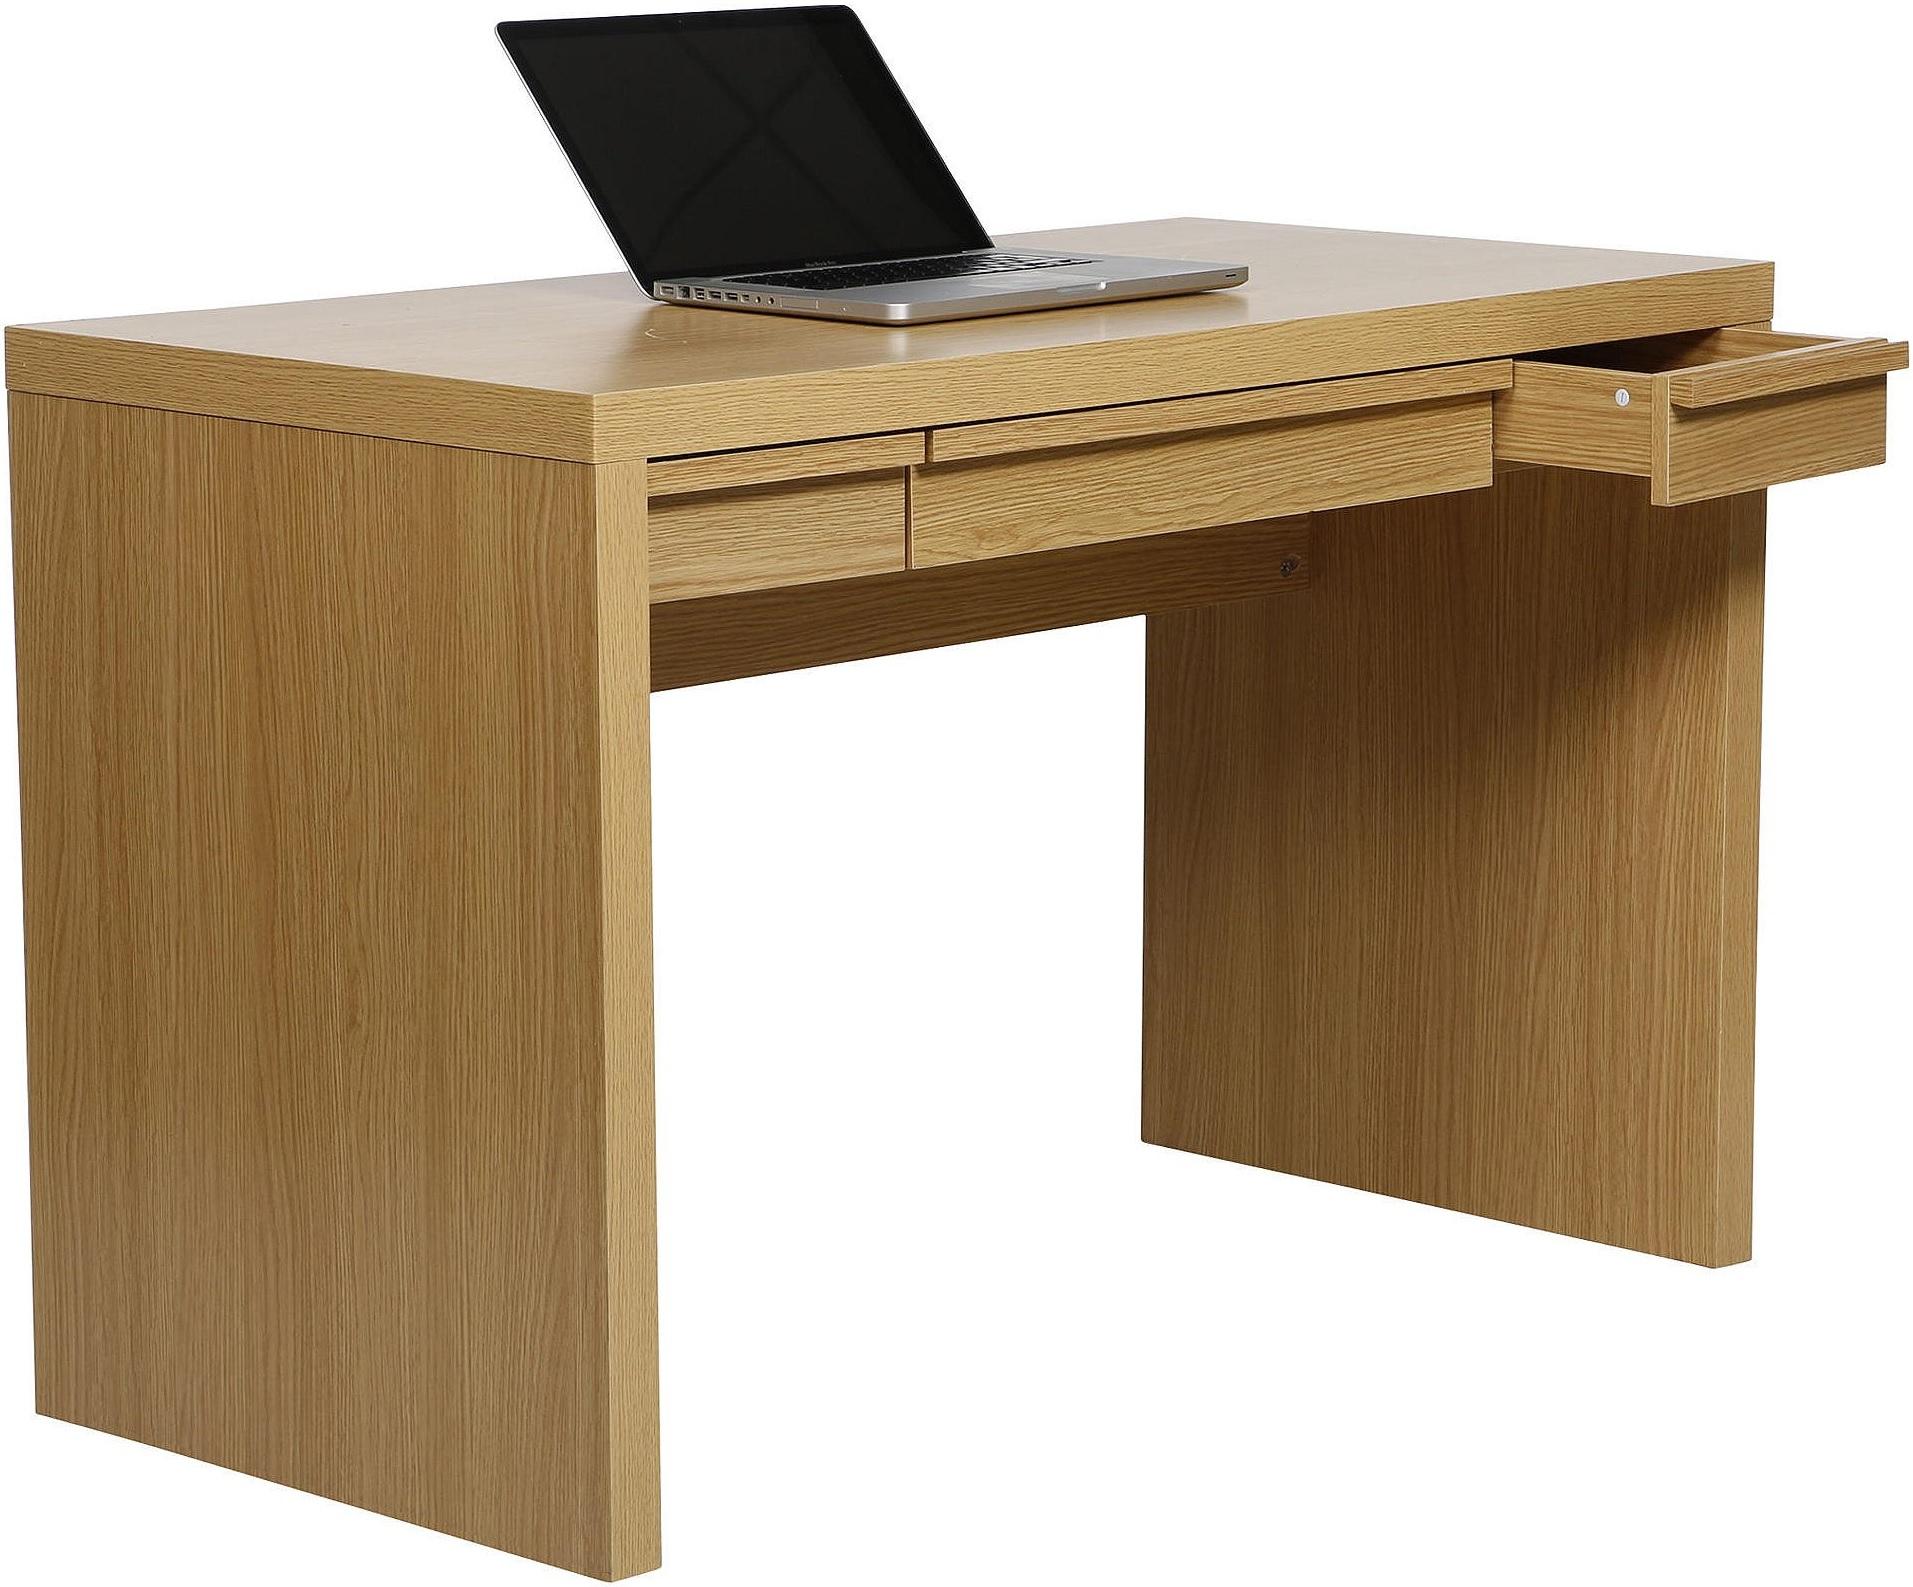 New Tesco Tribeca Computer Study Drawer Office Desk Oak Effect